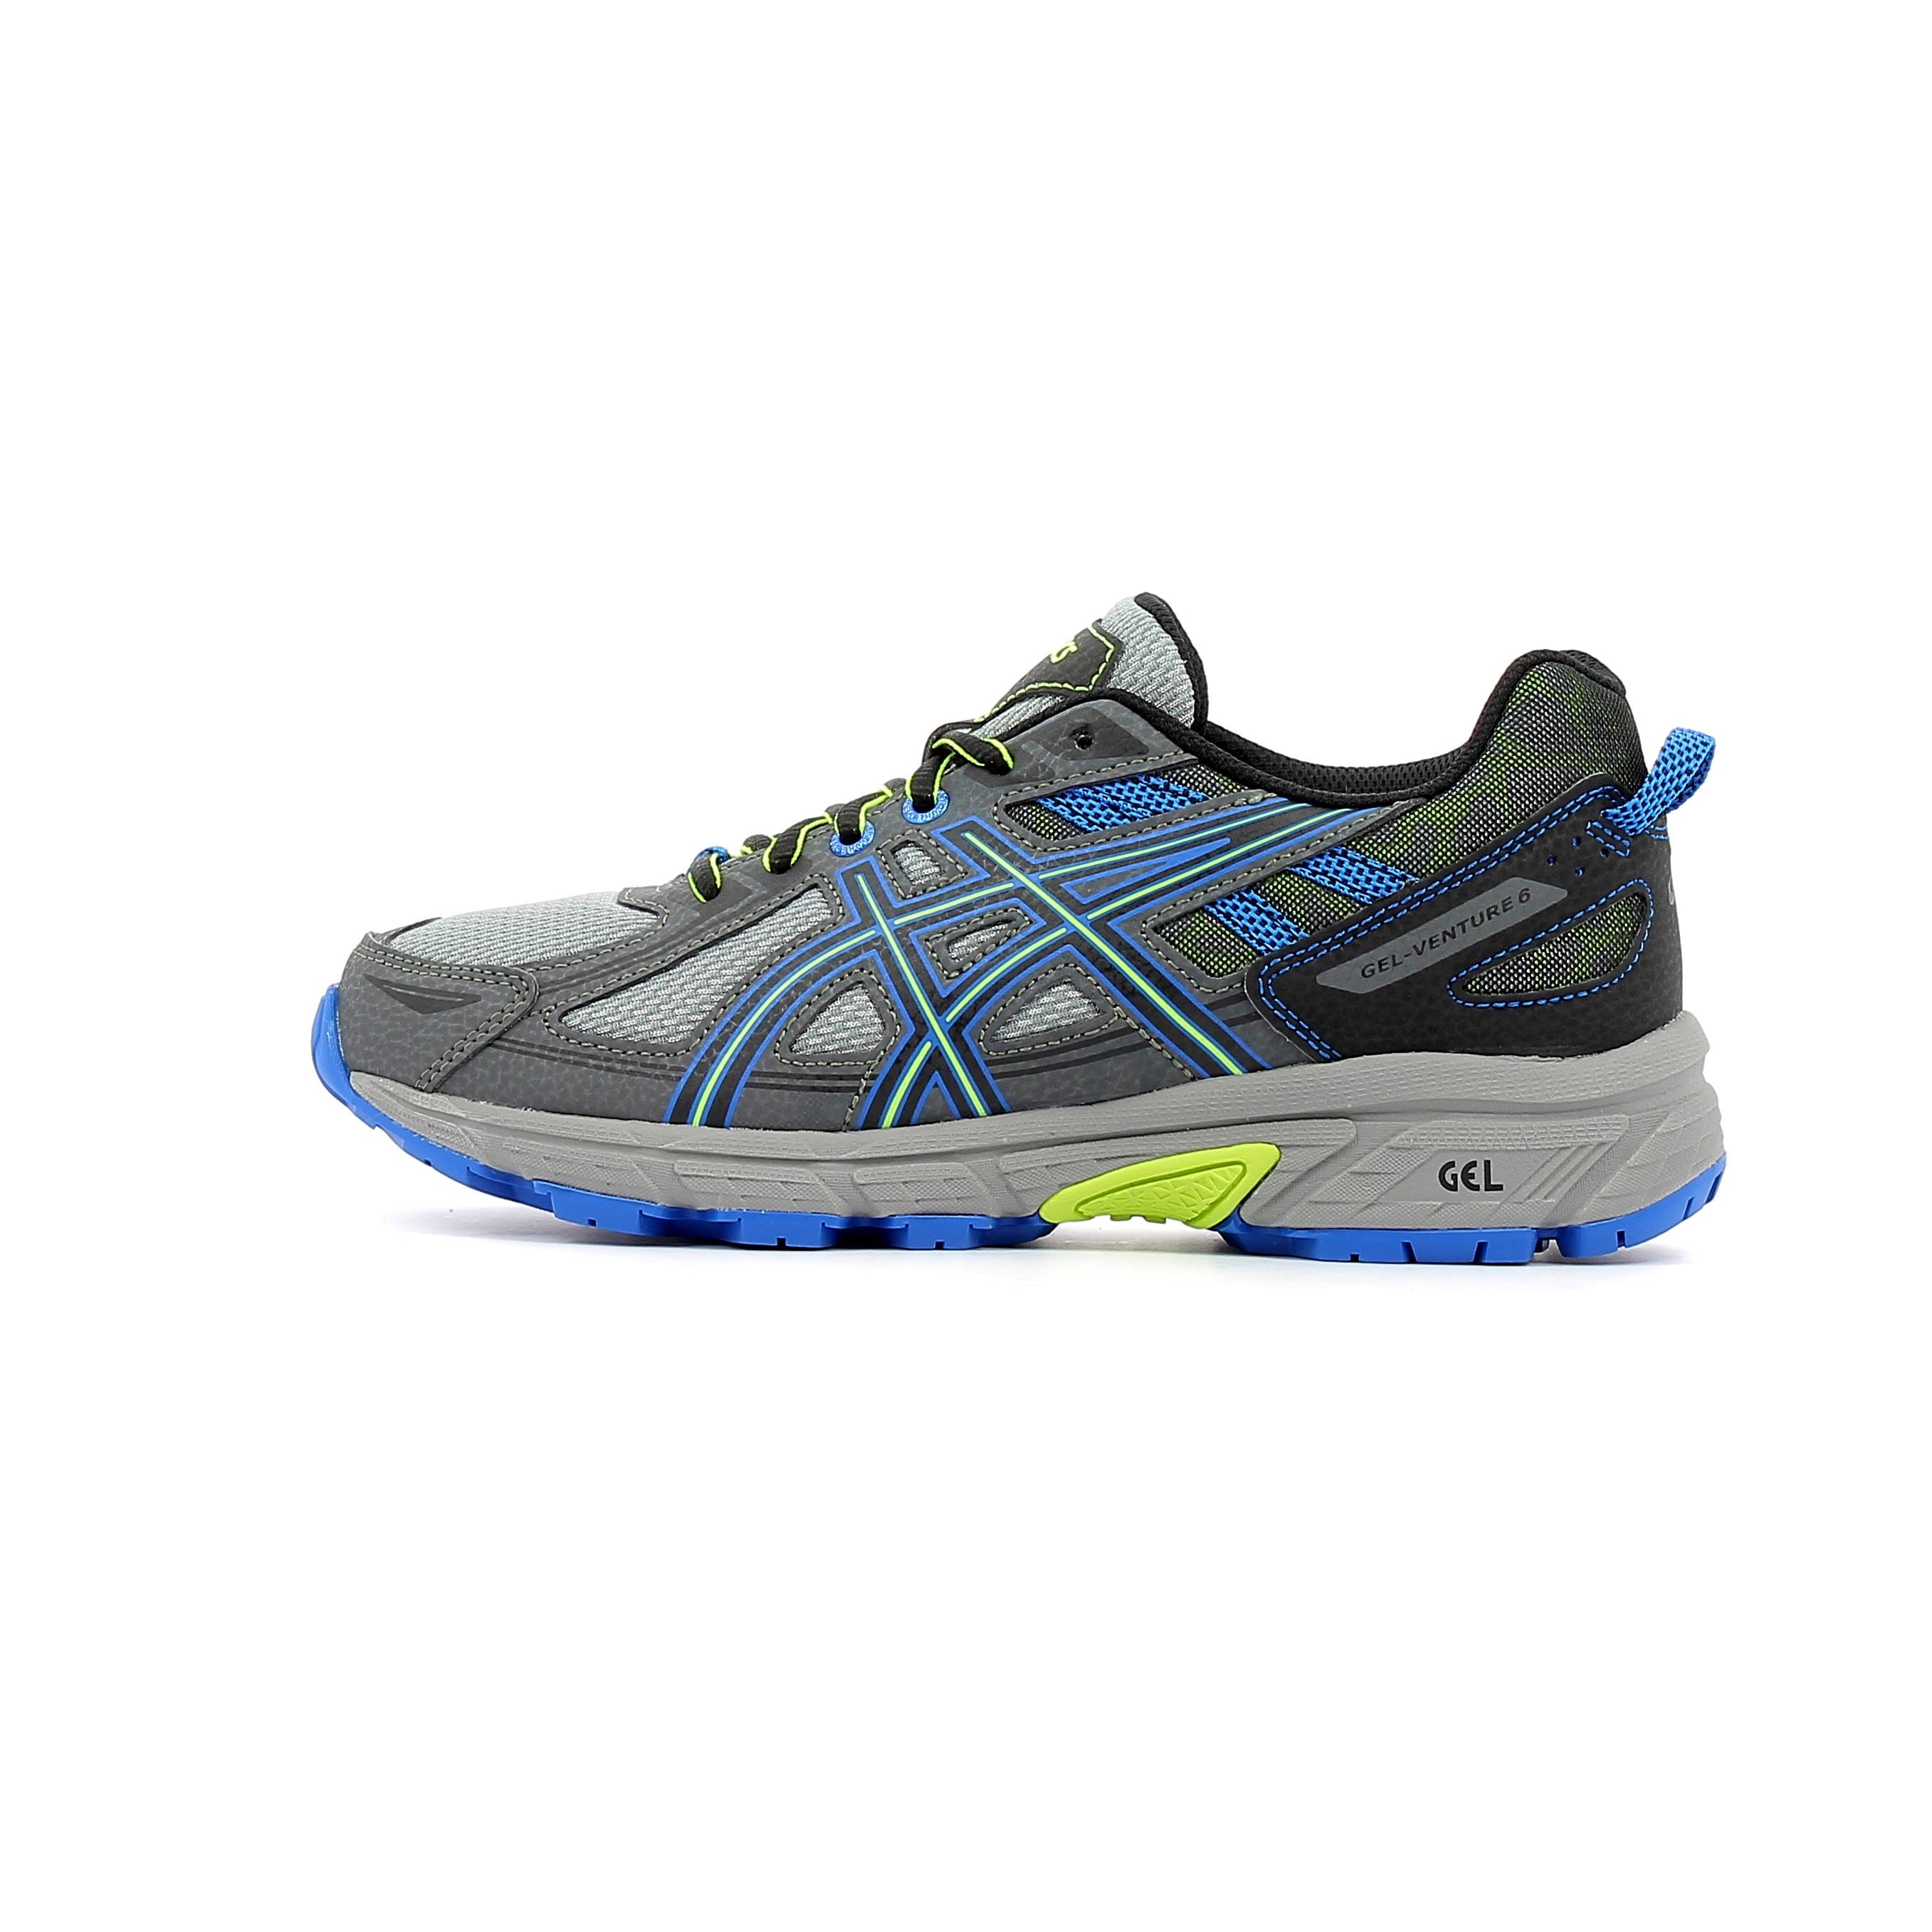 best service 8ead9 832ab Chaussure de Running Asics Gel Venture 6 GS enfant